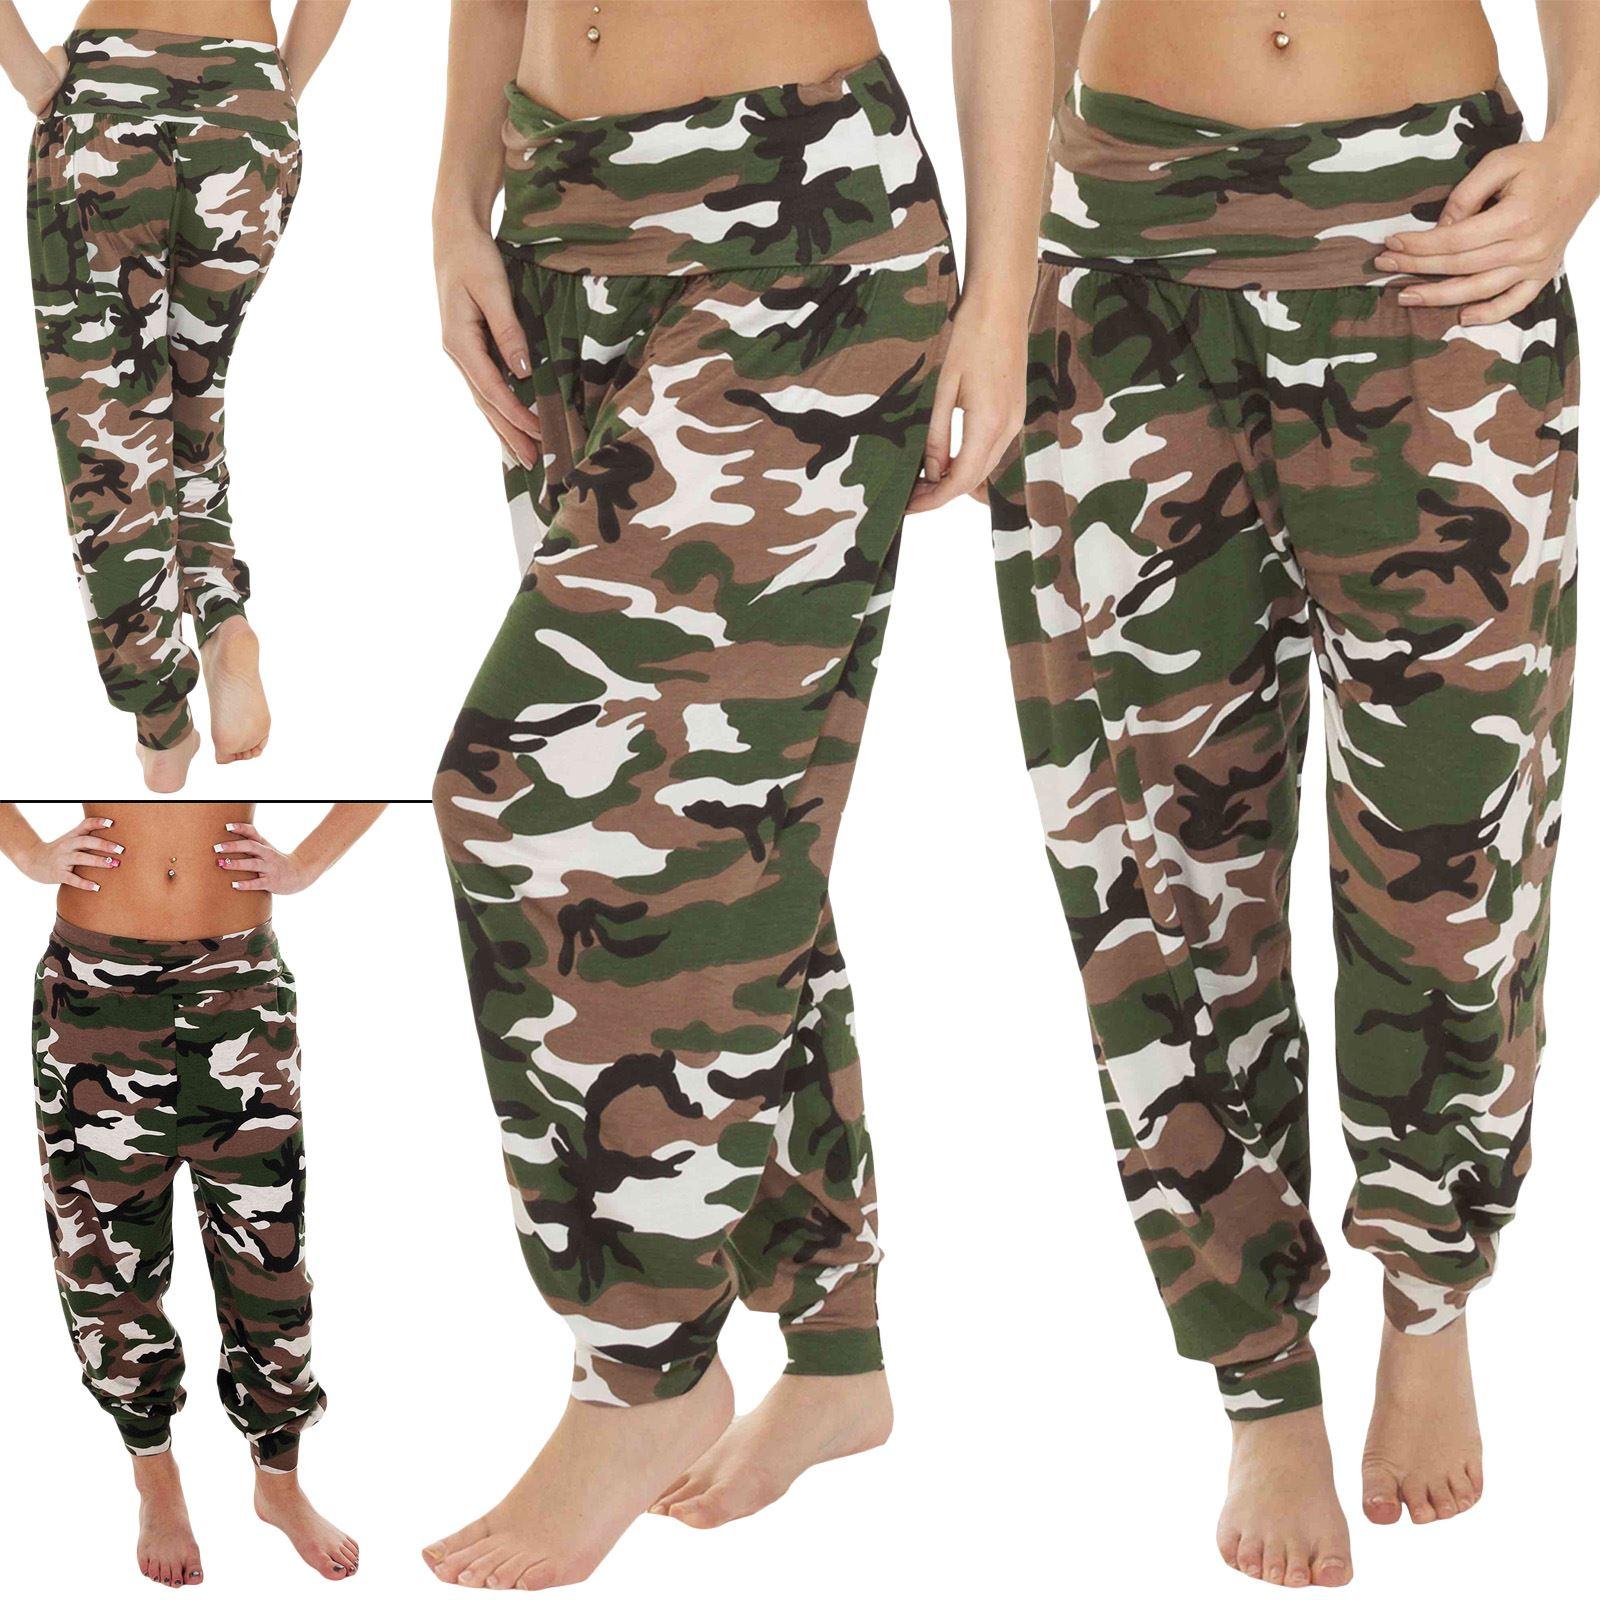 Pantalon Harem Con Estampado De Camuflaje Para Mujer Pantalones Harem De Mujer Ebay